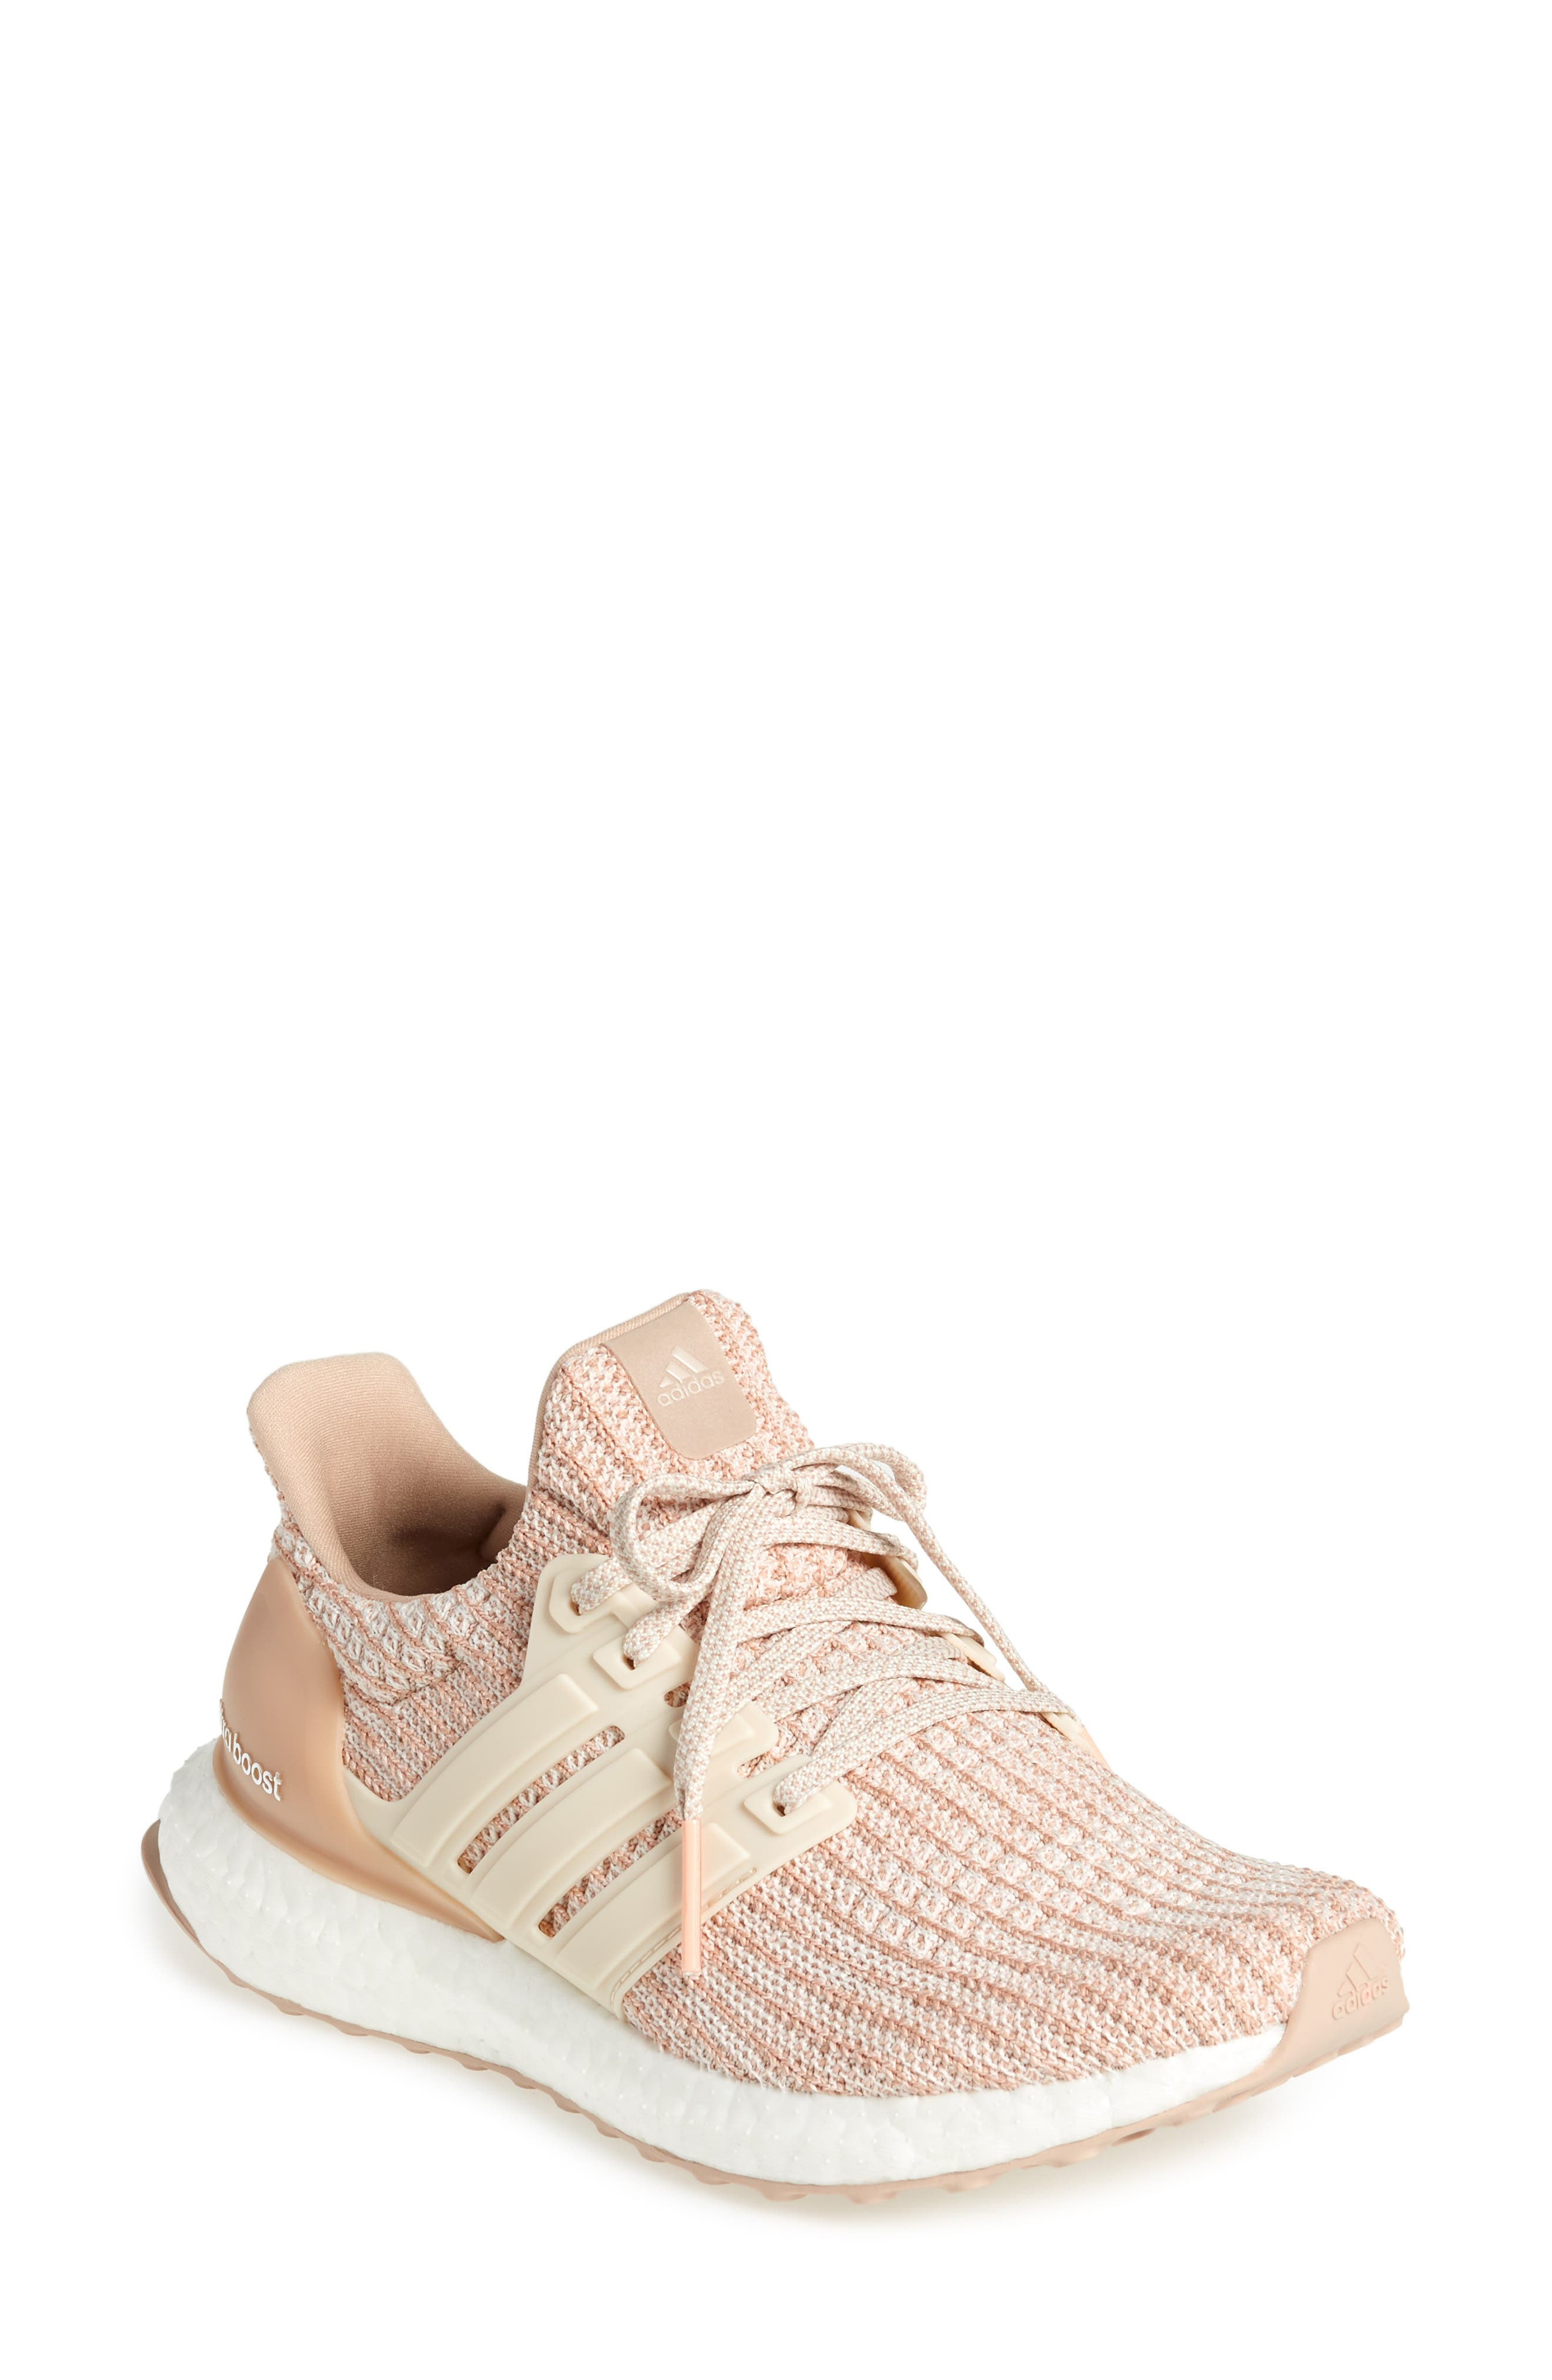 adidas | 'UltraBoost' Running Shoe